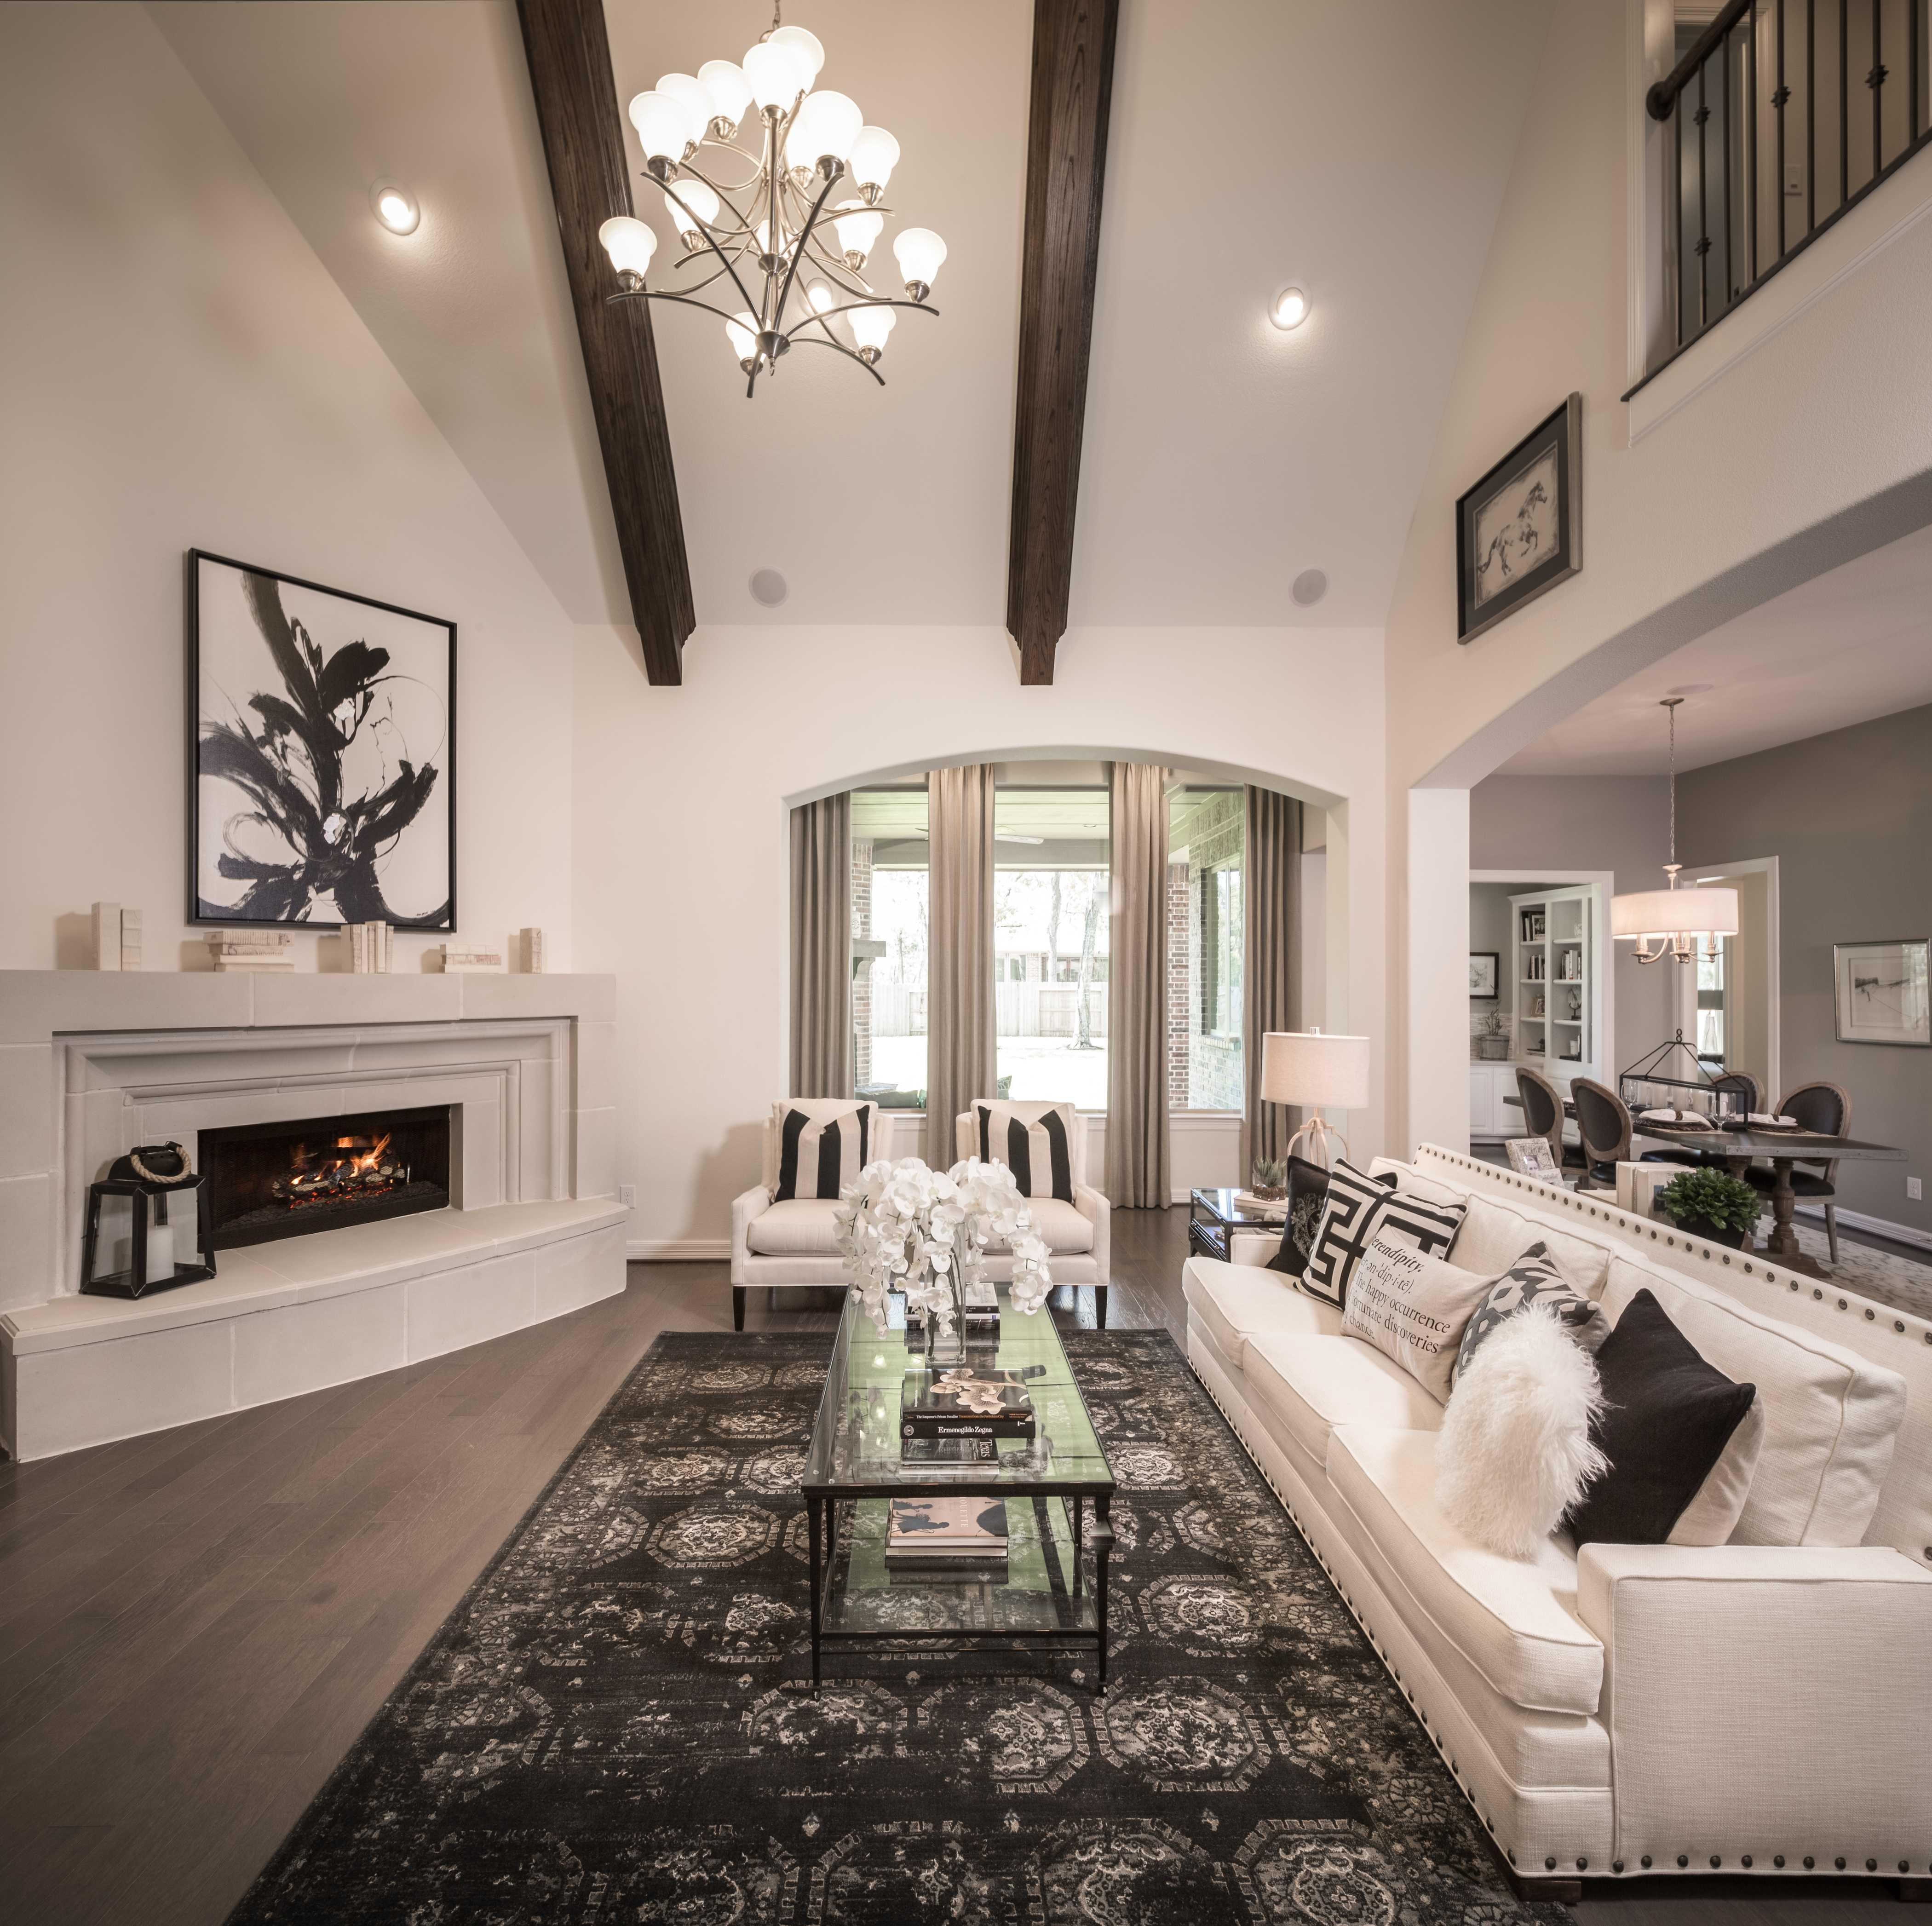 Representative Photo   family room. Model Home in Houston Texas  Sienna Plantation 75s community